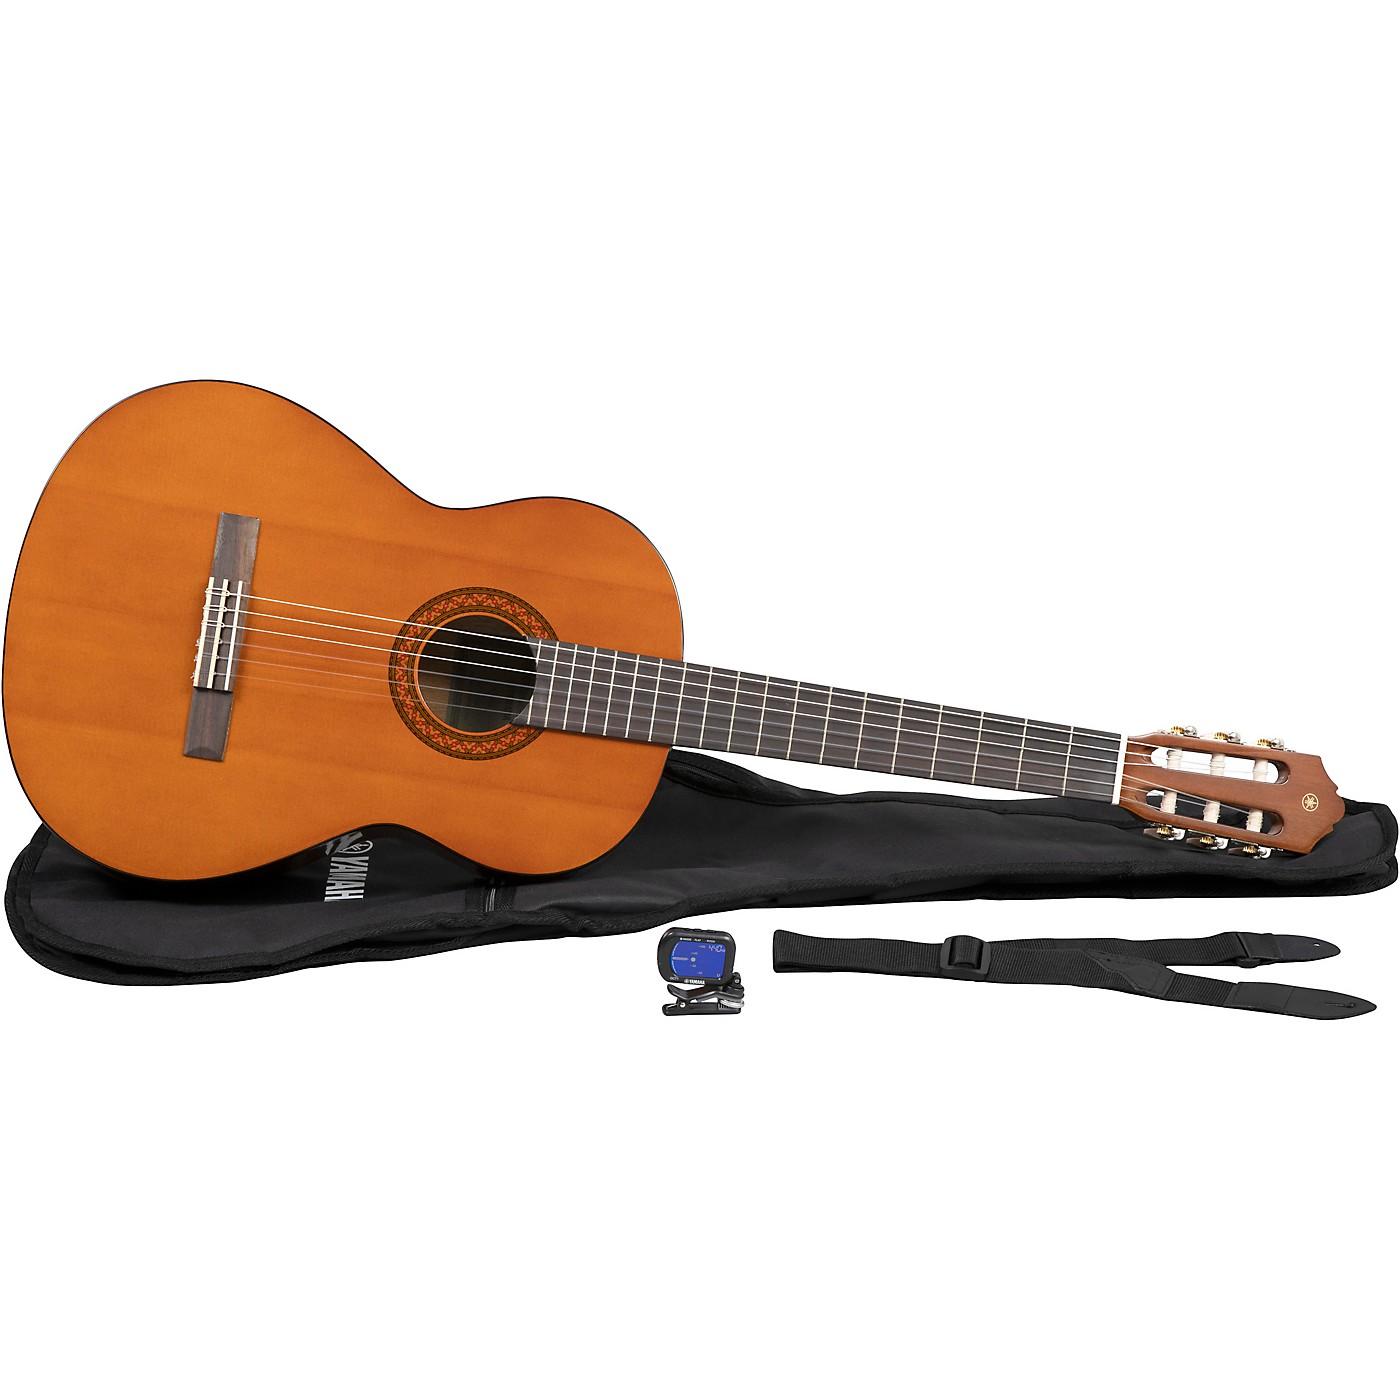 Yamaha C40 Gigmaker Classical Acoustic Guitar Pack (Natural) thumbnail